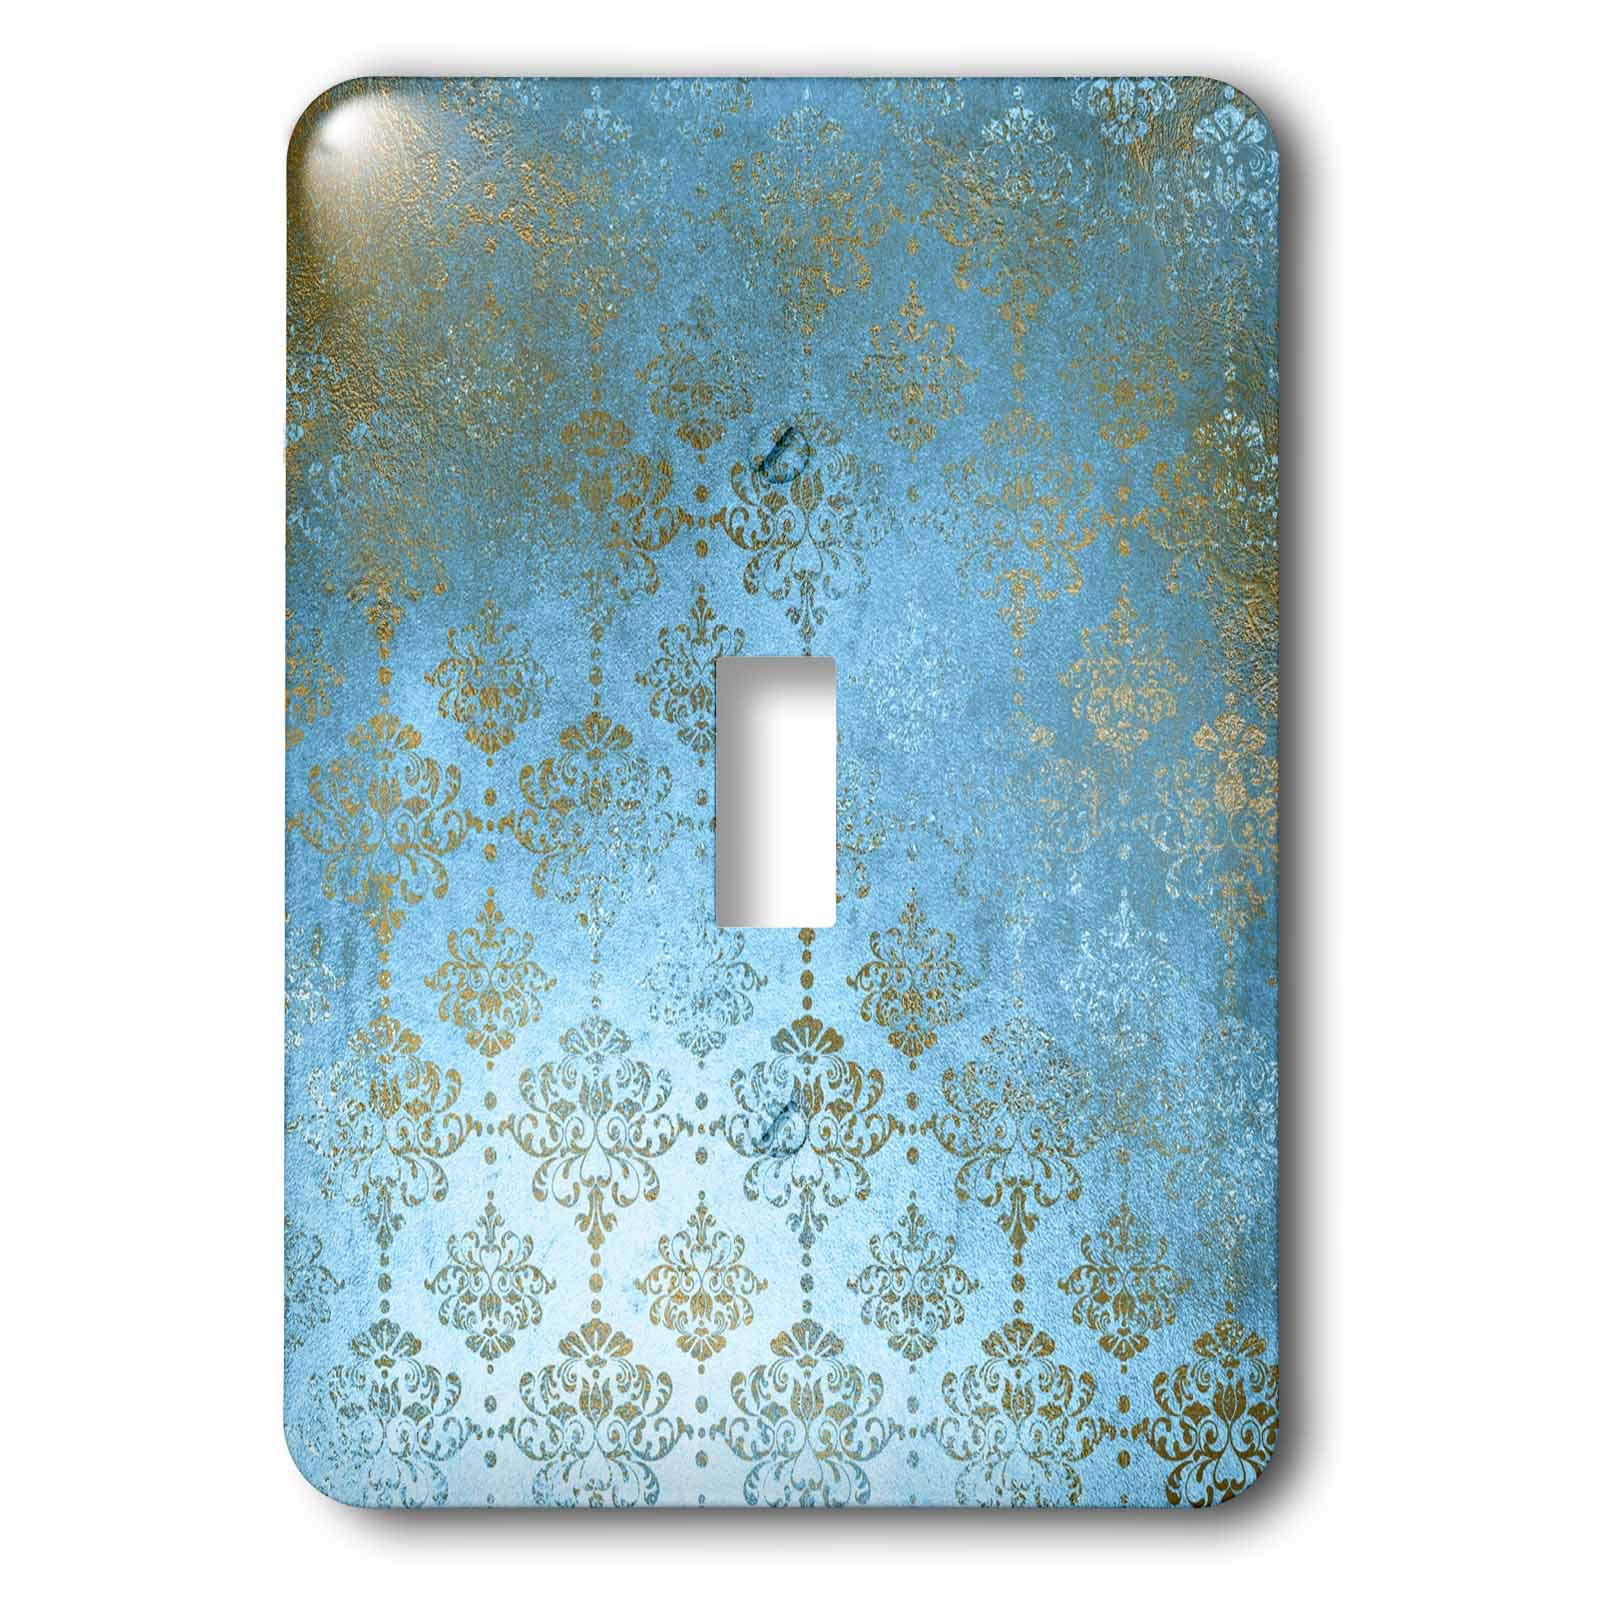 3dRose Uta Naumann Faux Glitter Pattern - Image of Sky Blue and Gold Metal Foil Vintage Grunge Luxury Damask Pattern - Light Switch Covers - single toggle switch (lsp_290169_1)